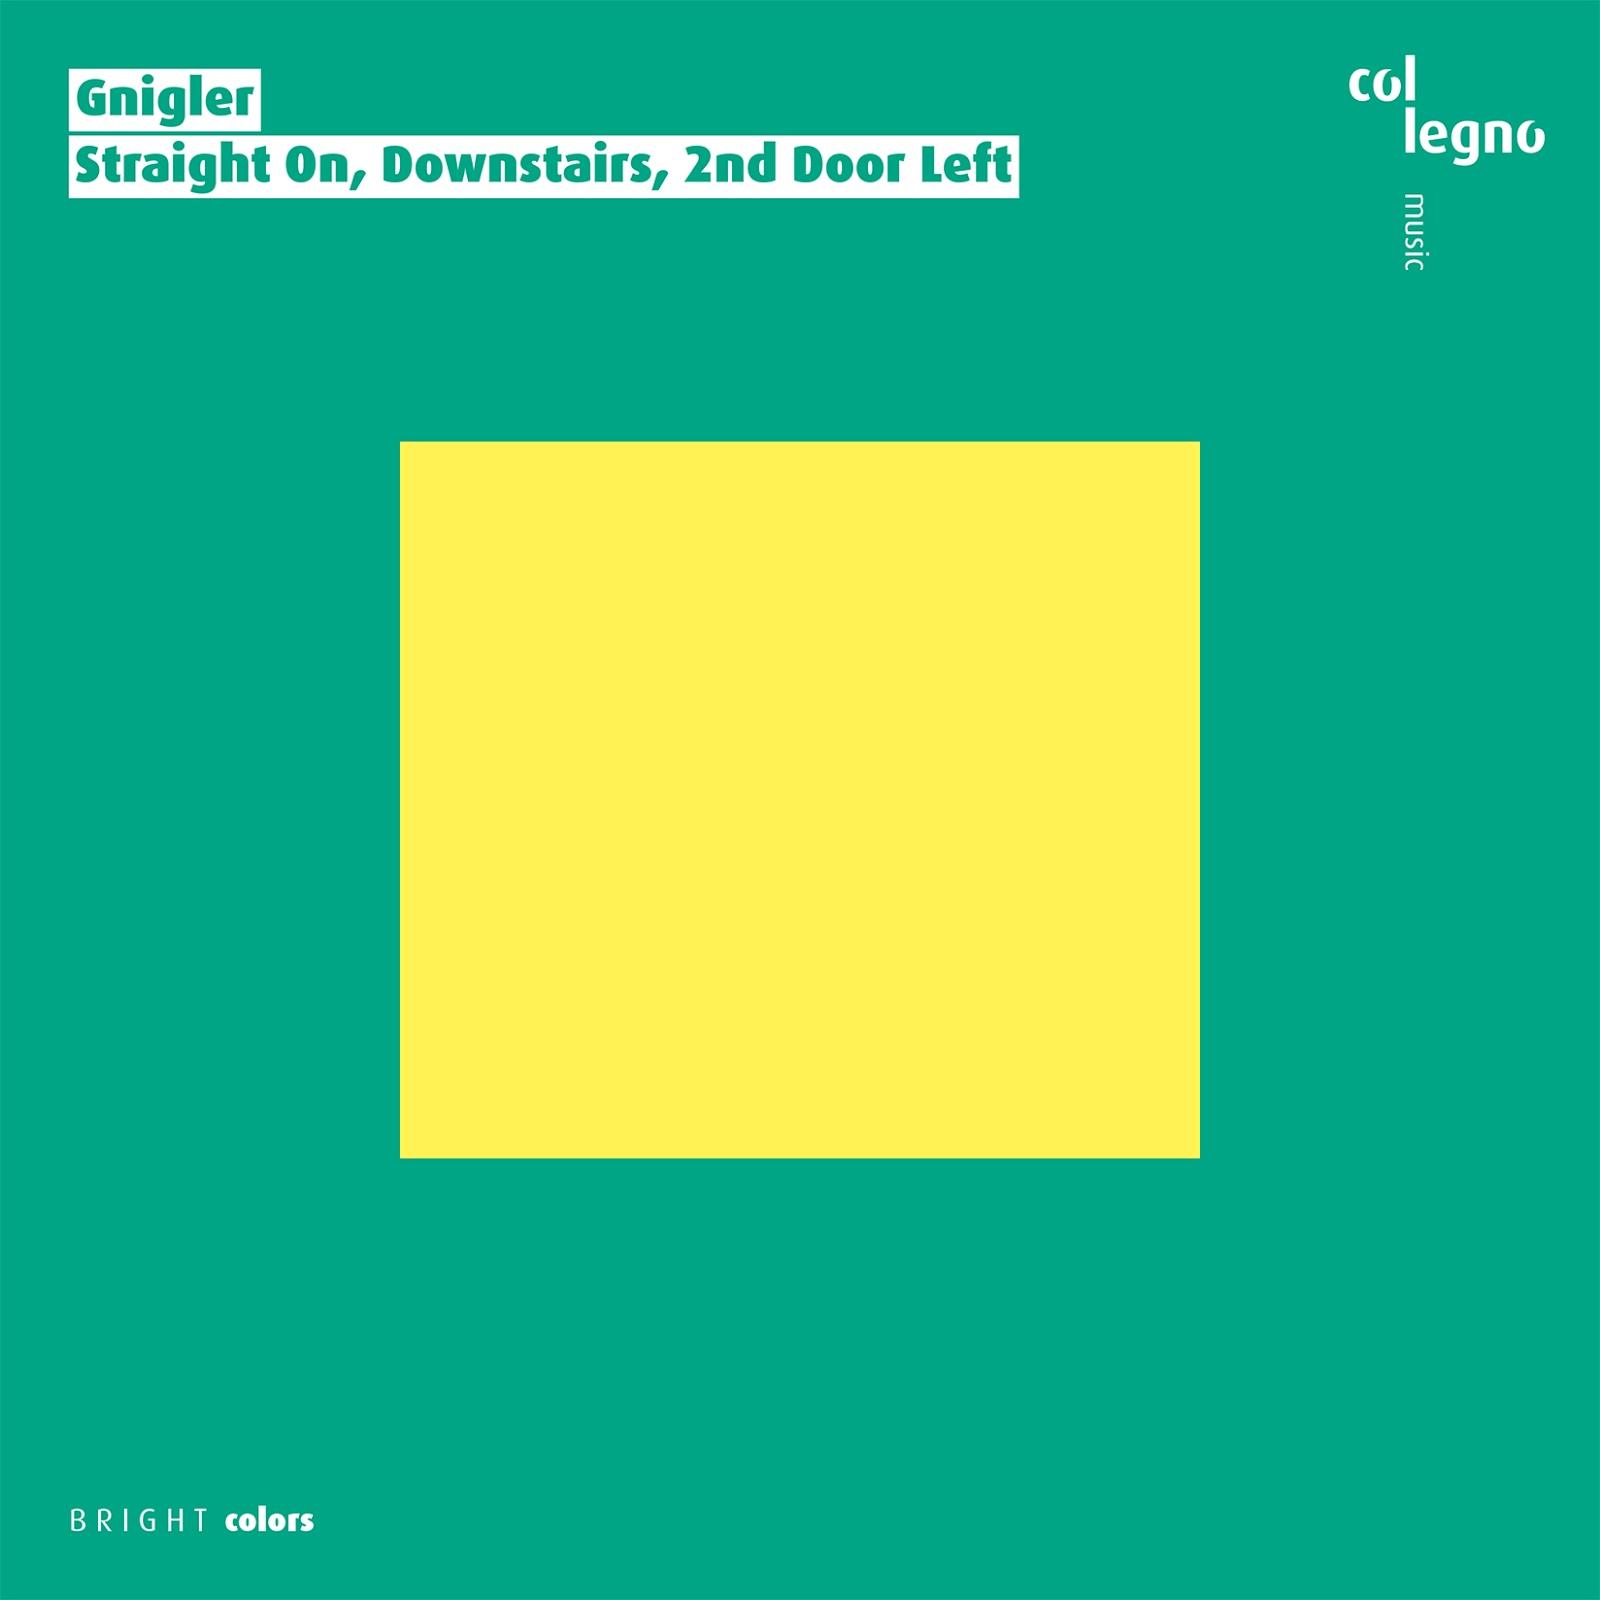 Gnigler - Straight On, Downstairs, 2nd Door Left (Col Legno, 2018 ...